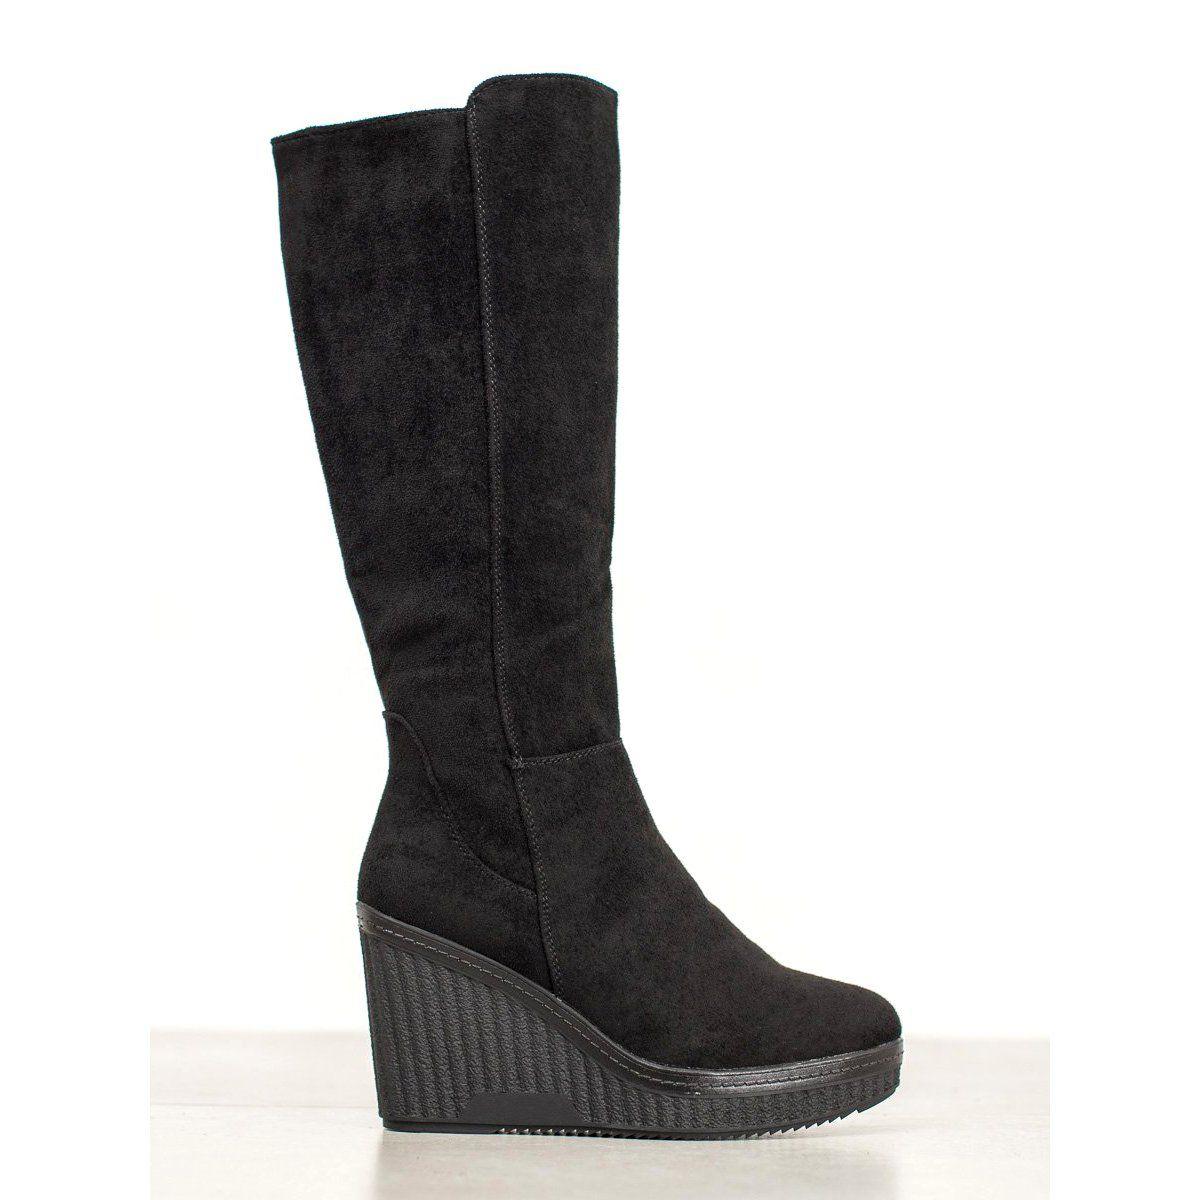 Filippo Czarne Kozaki Na Koturnie Black Wedge Boots Boots Wedge Boots